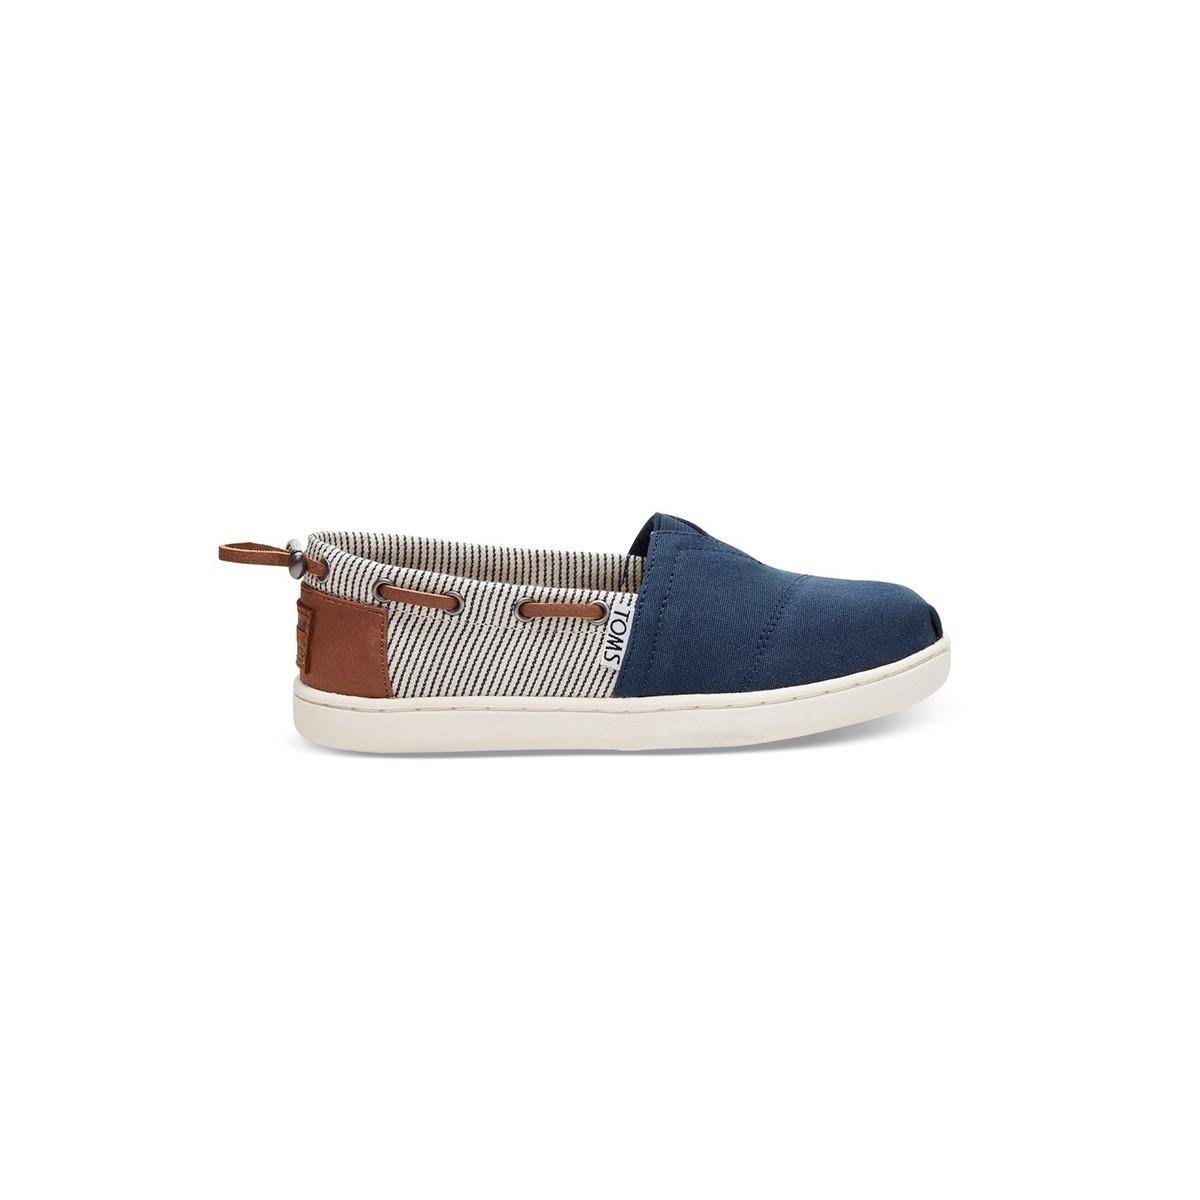 Chaussures toile rayé bateau velcro junior